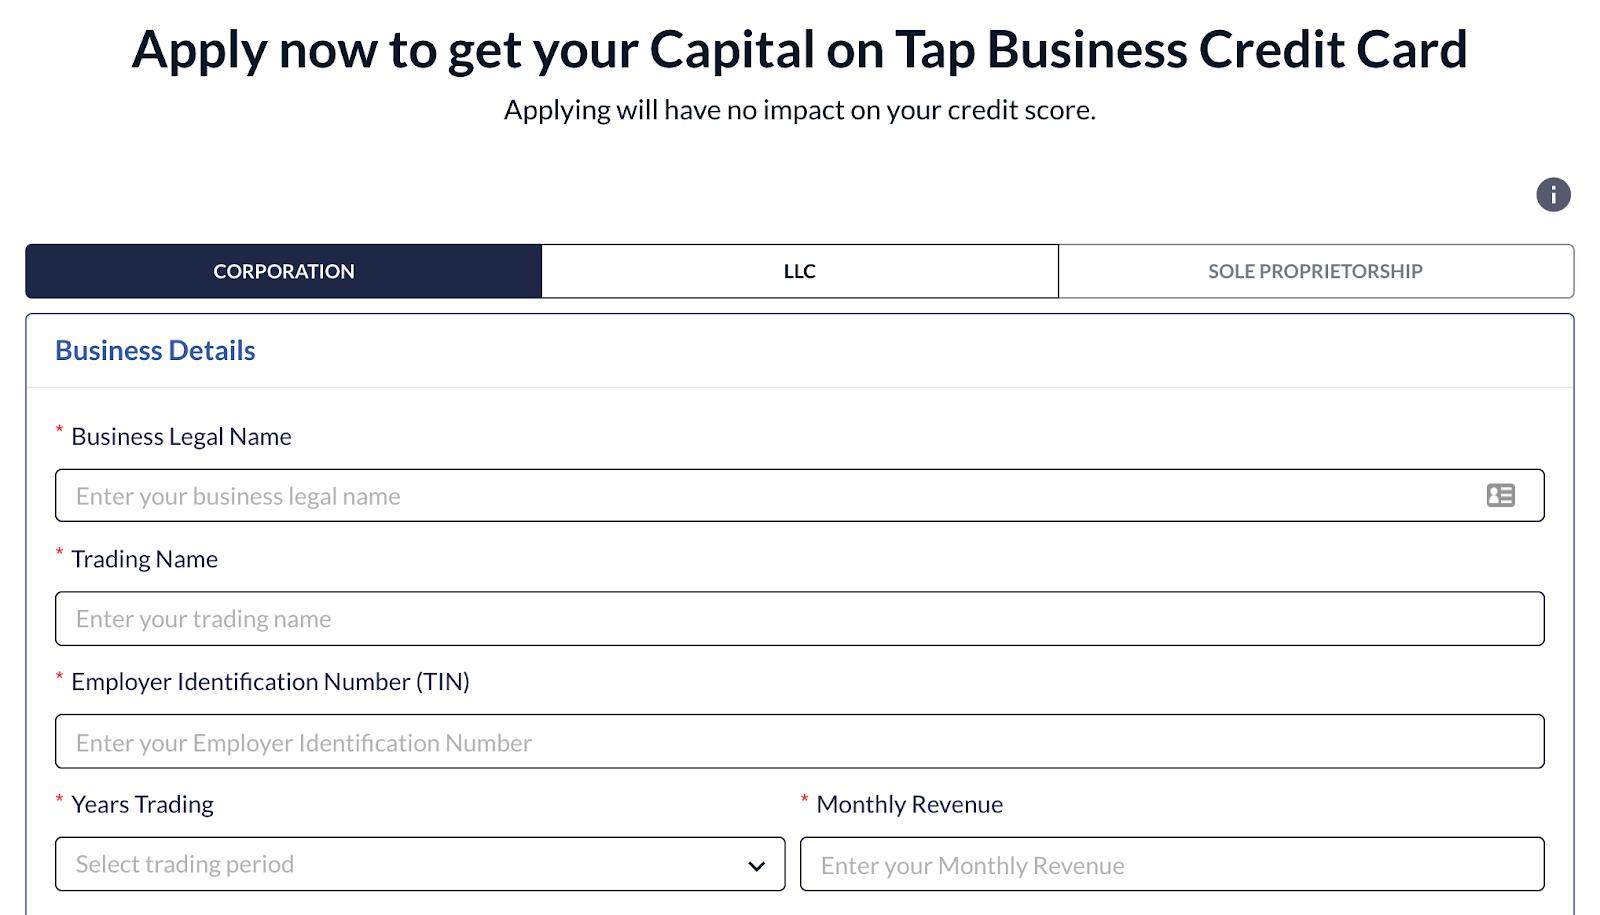 Capital on Tap login